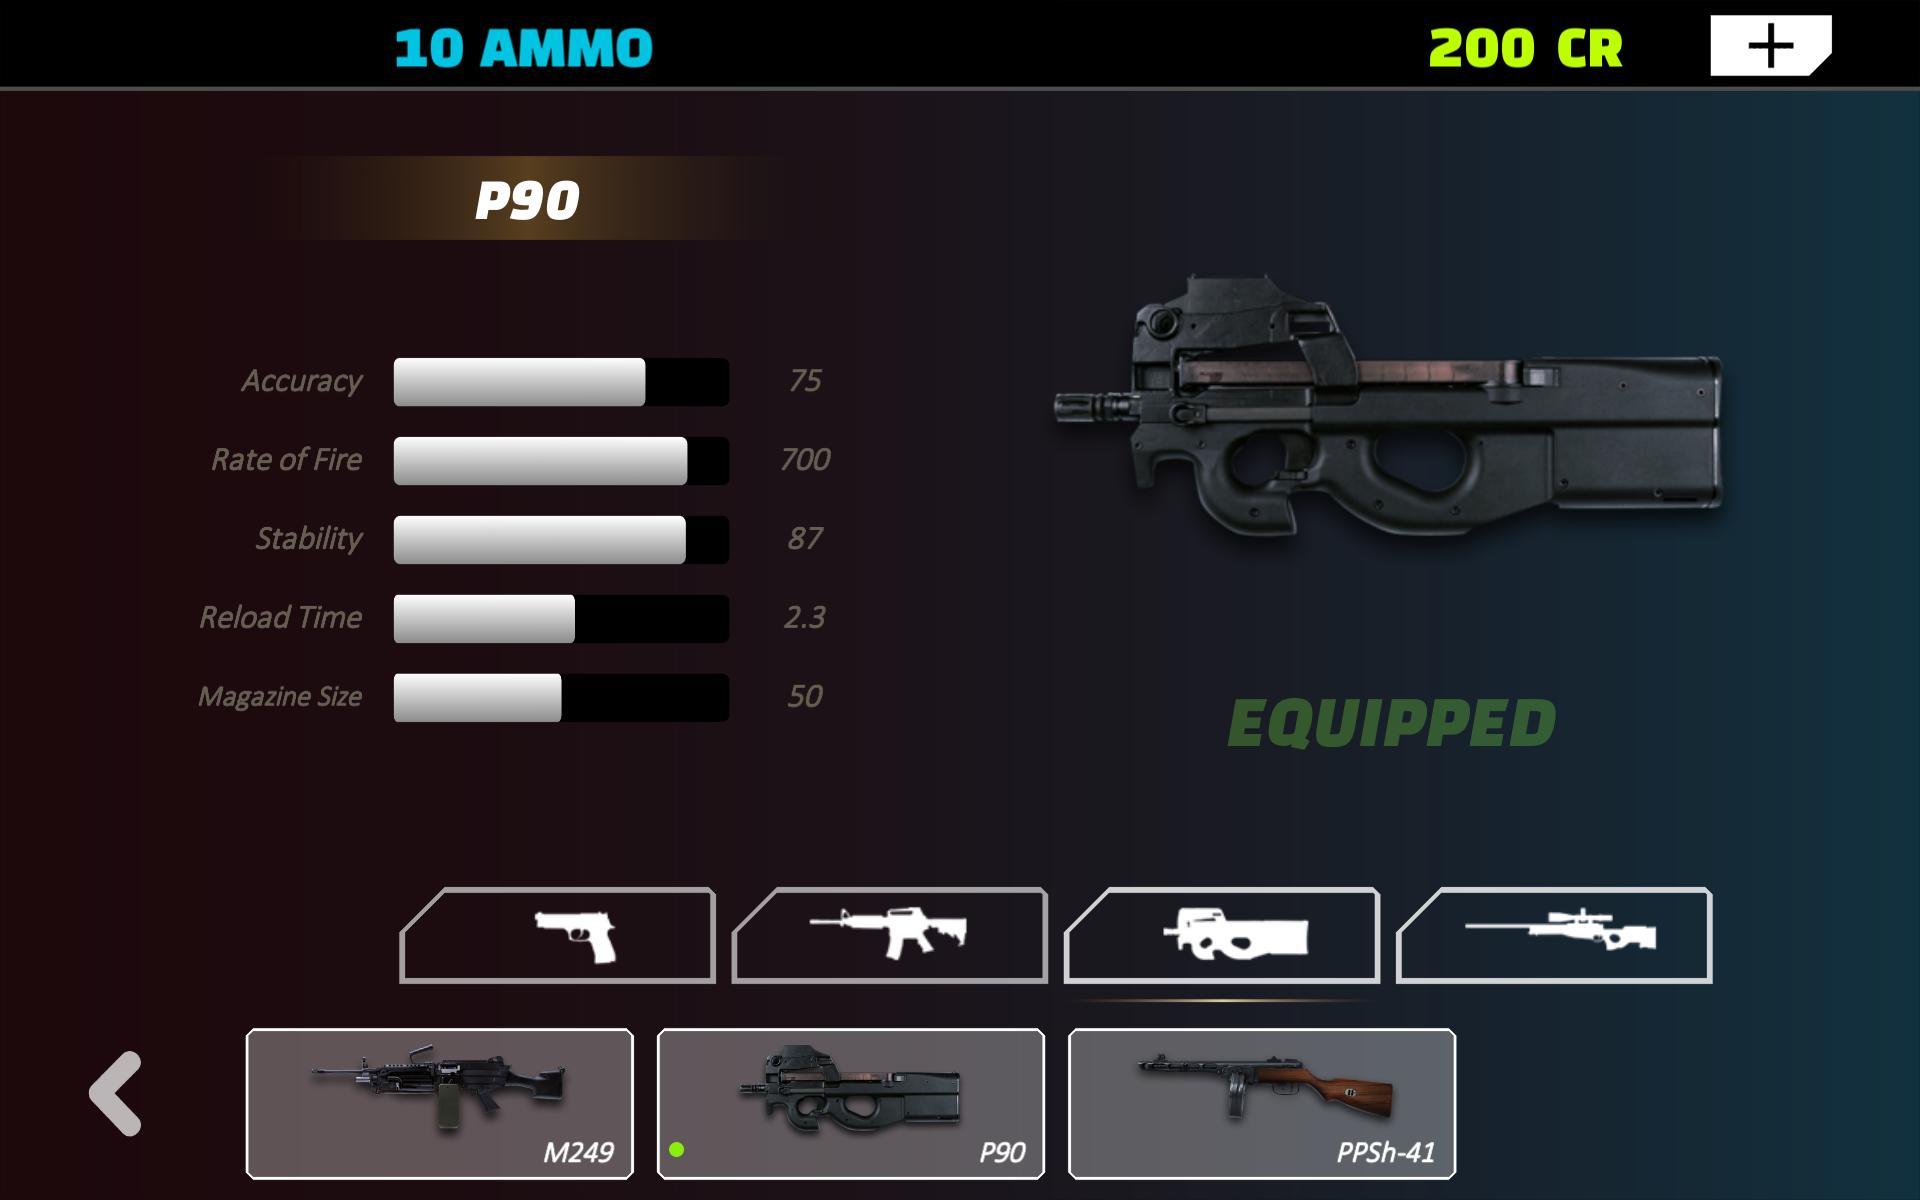 Canyon Shooting 2 - Free Shooting Range 3.0.6 Screenshot 17